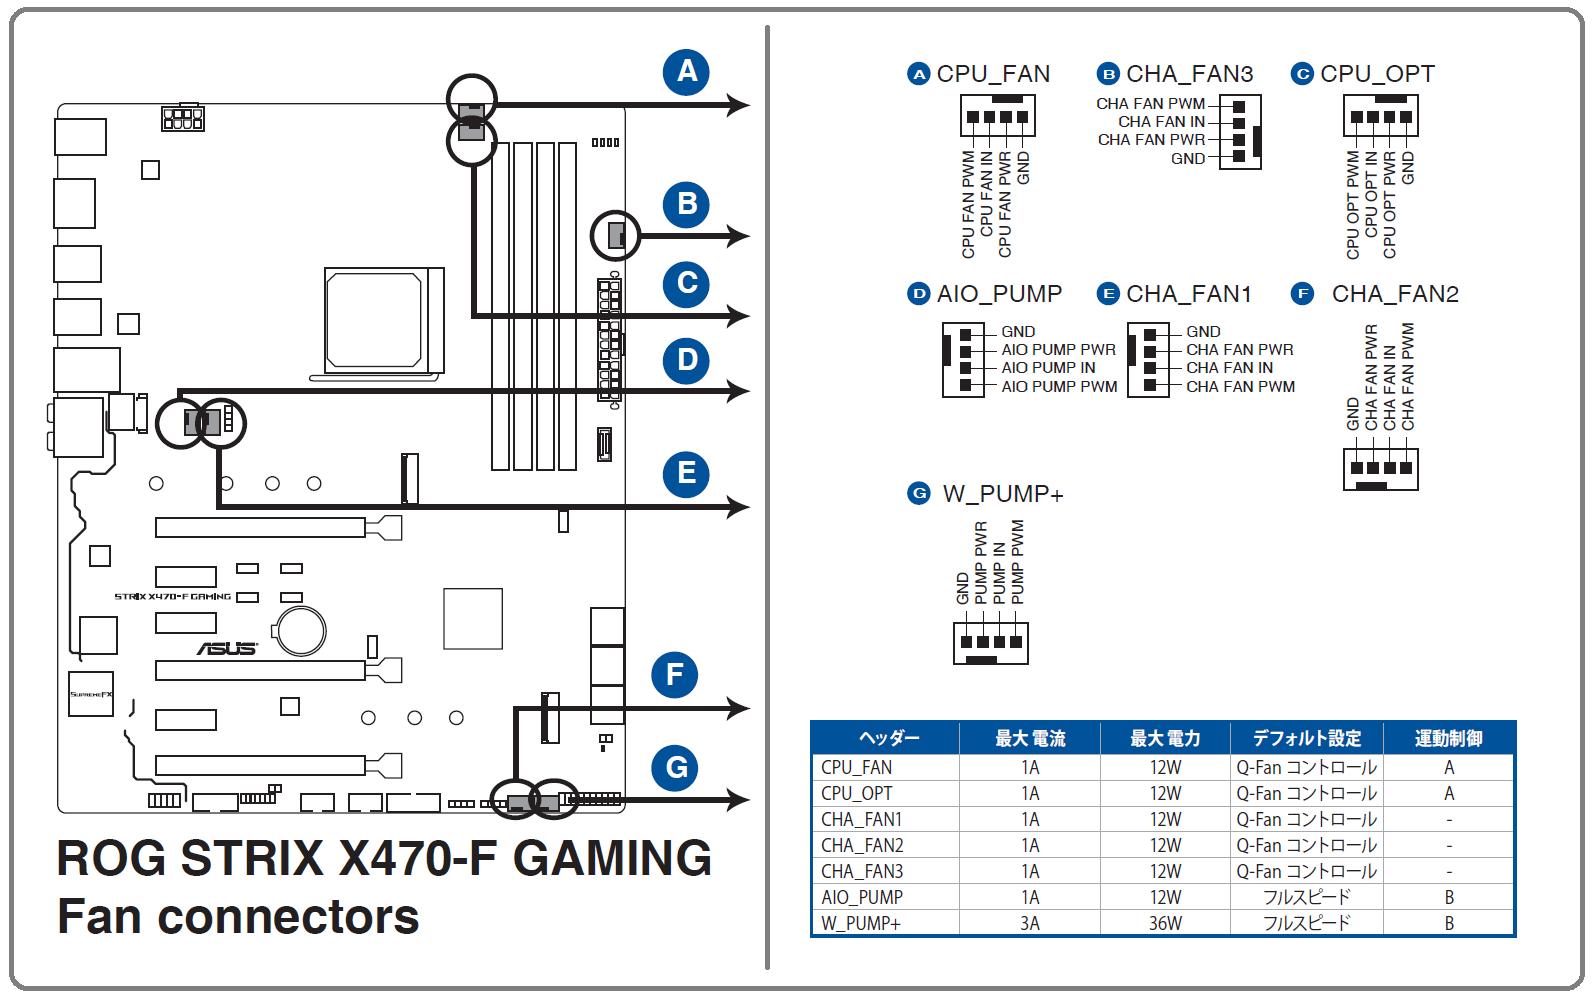 ASUS ROG STRIX X470-F GAMING_Fan